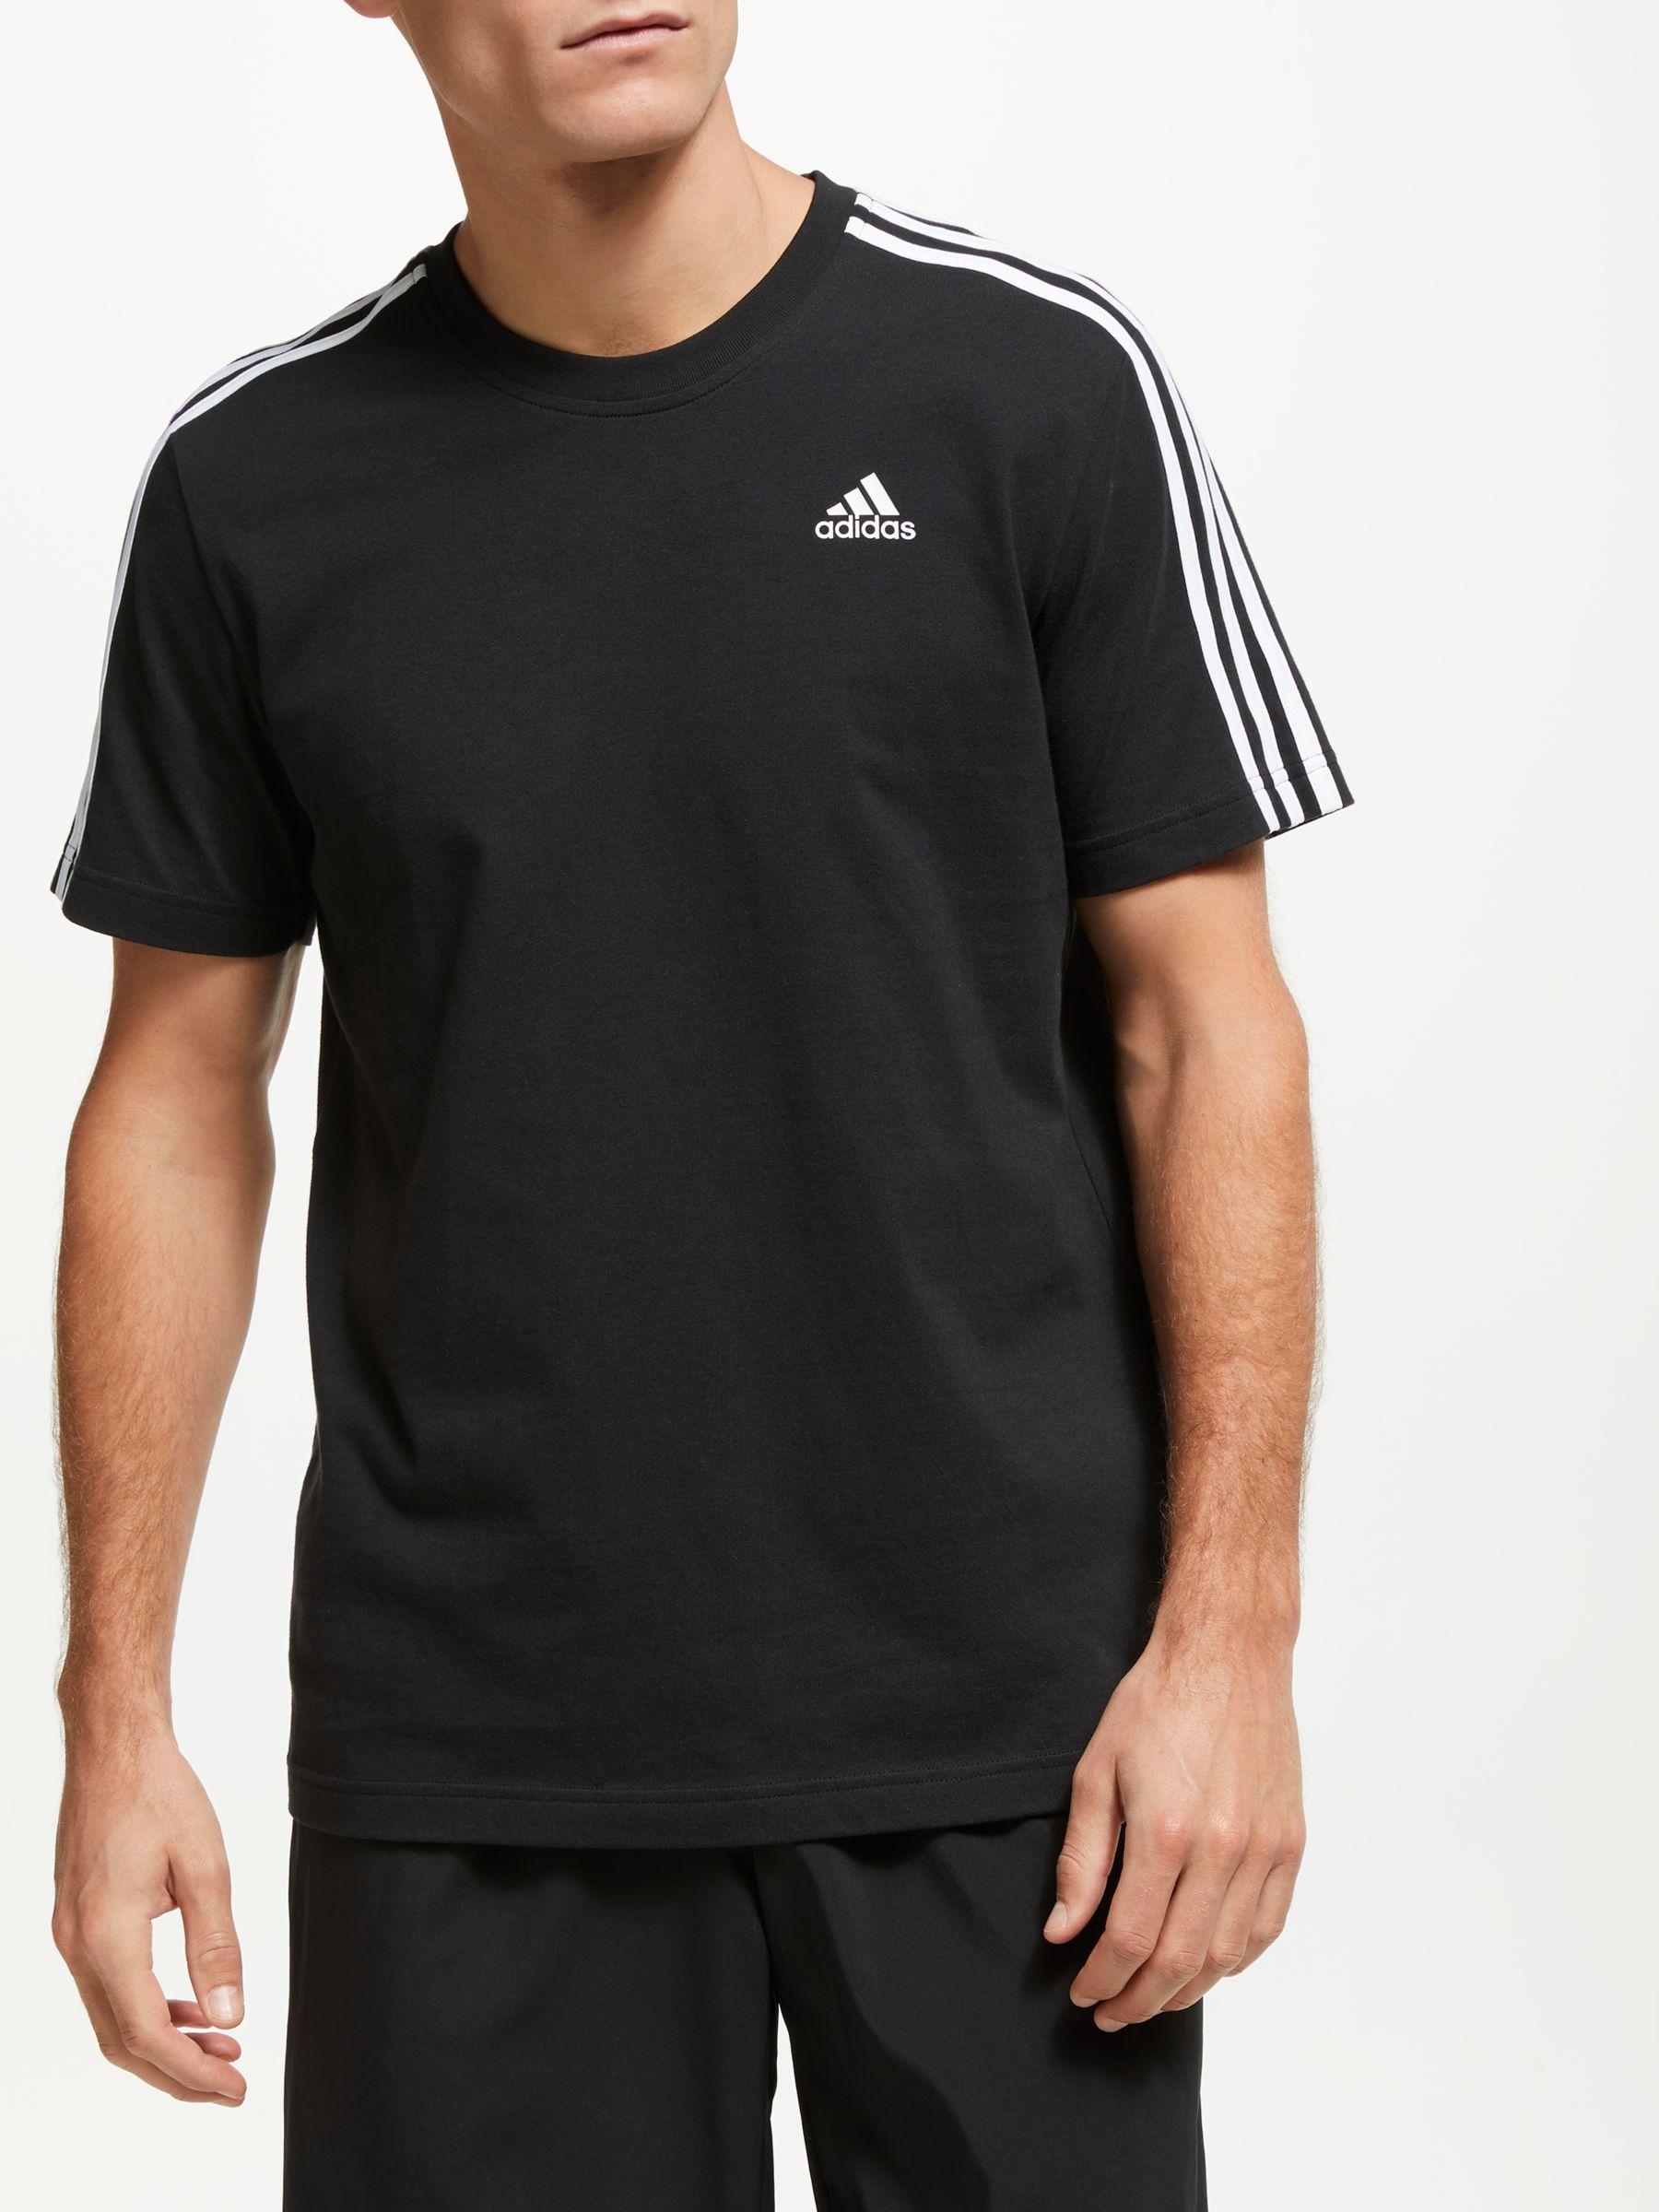 adidas essentials t shirt mens